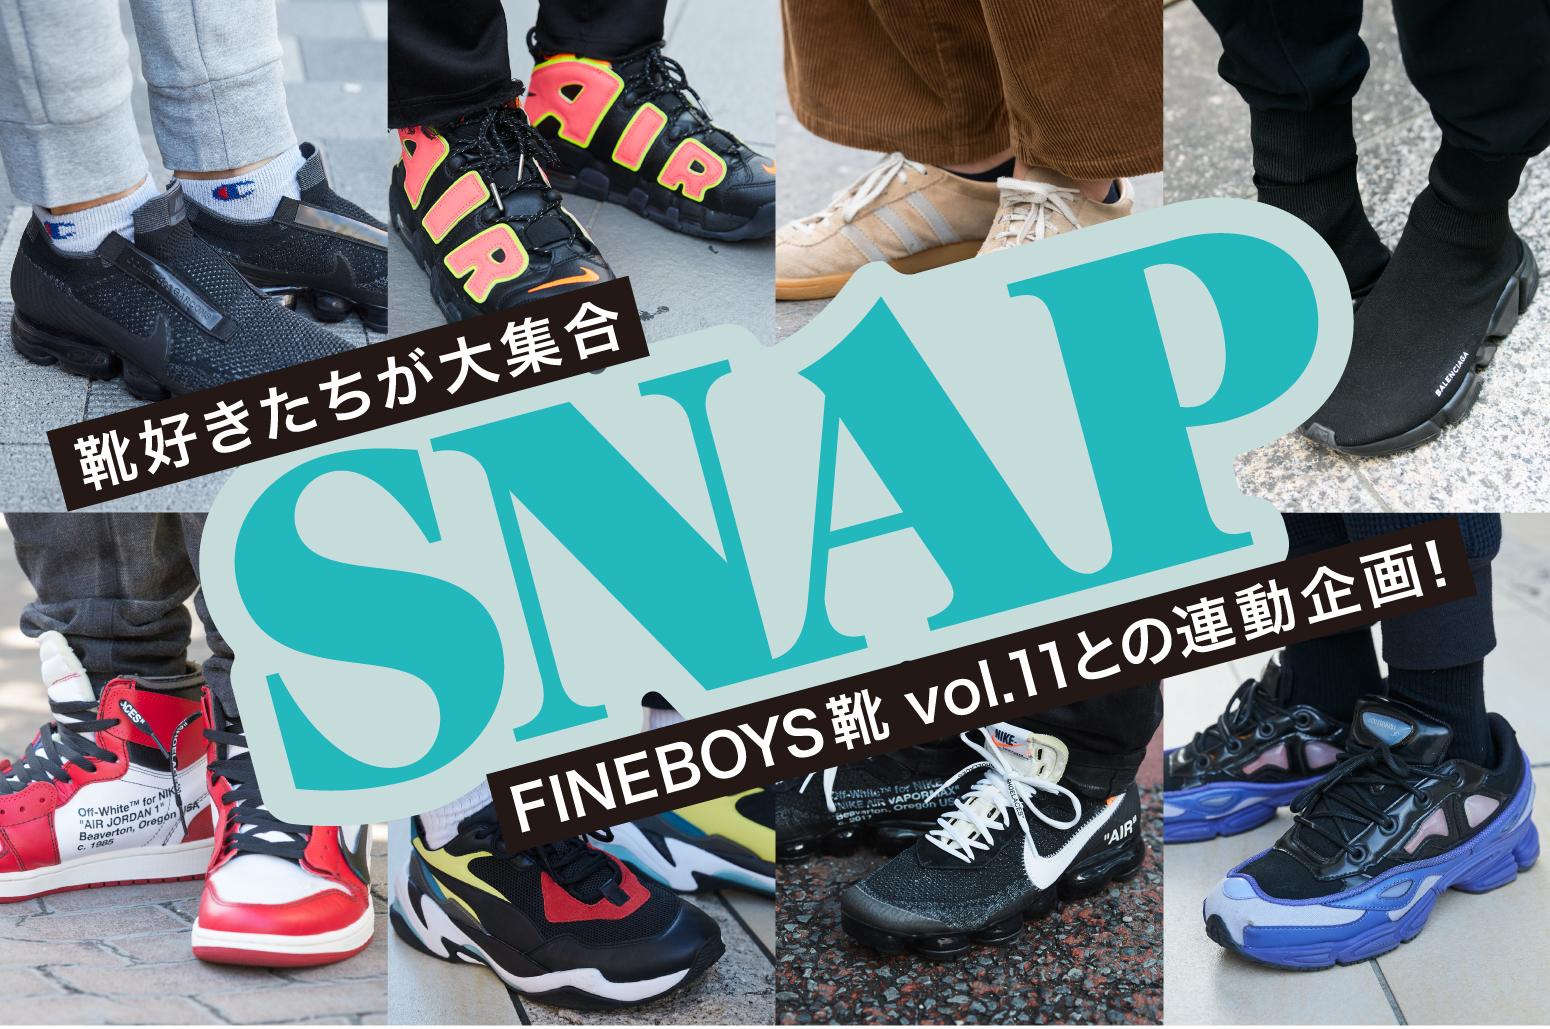 FINEBOYS 靴vol.11 スナップ大公開! 前編「街でリアルに履かれている」スニーカーSNAP